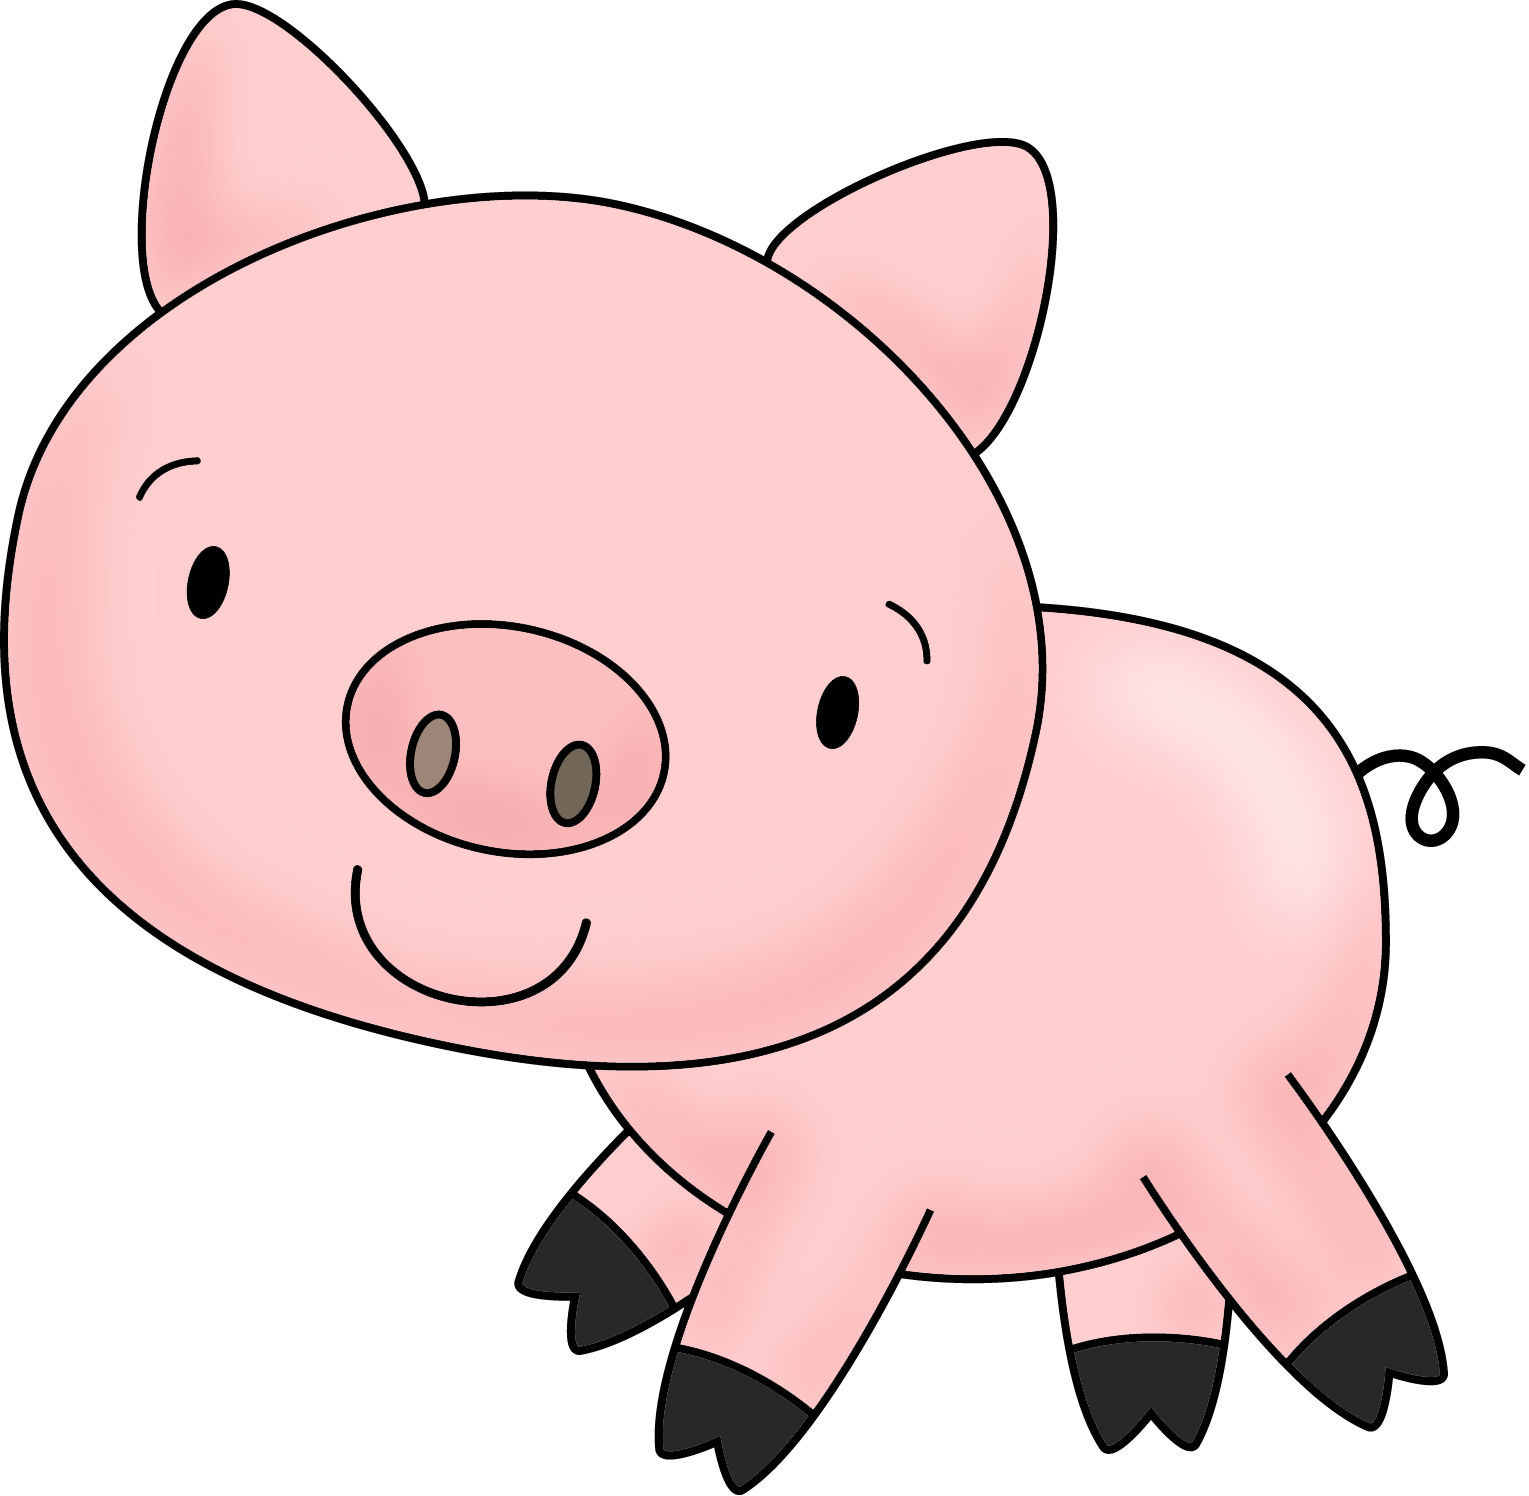 Cute Pigs Cartoon - ClipArt Best